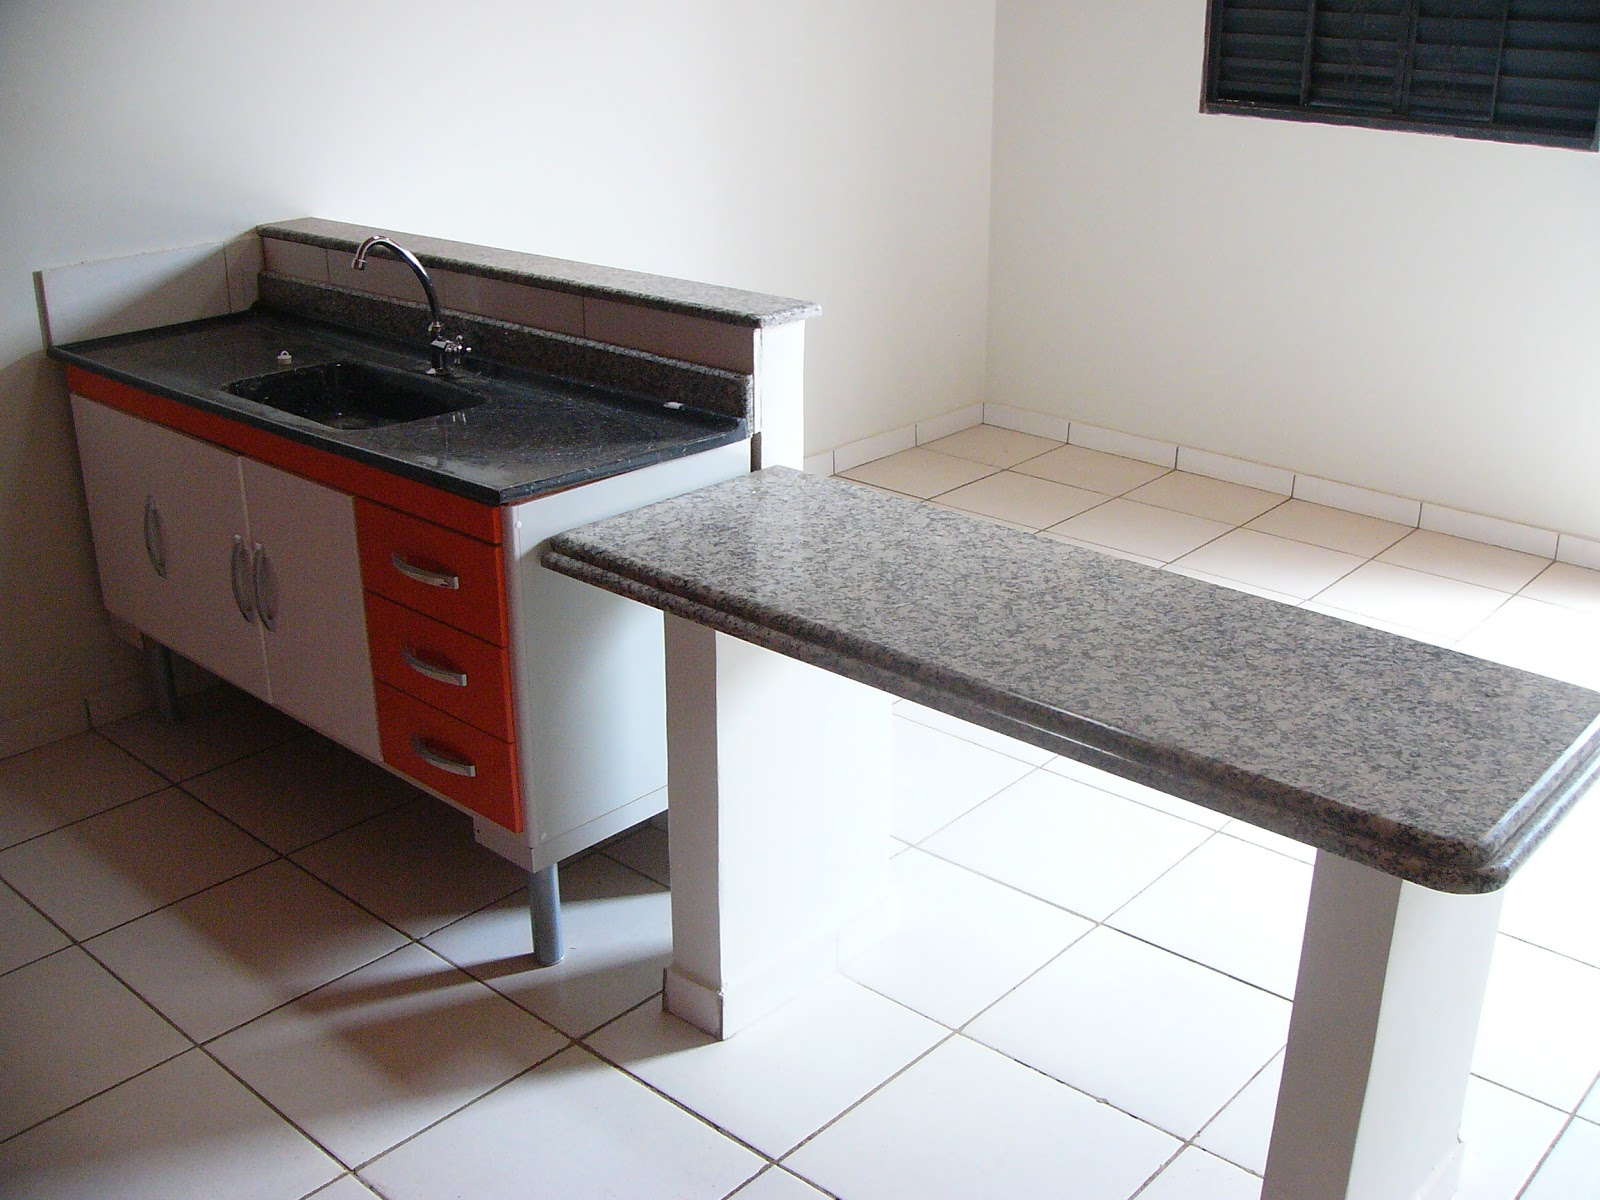 Bancada da pia de cozinha com #5D3D36 1600 1200